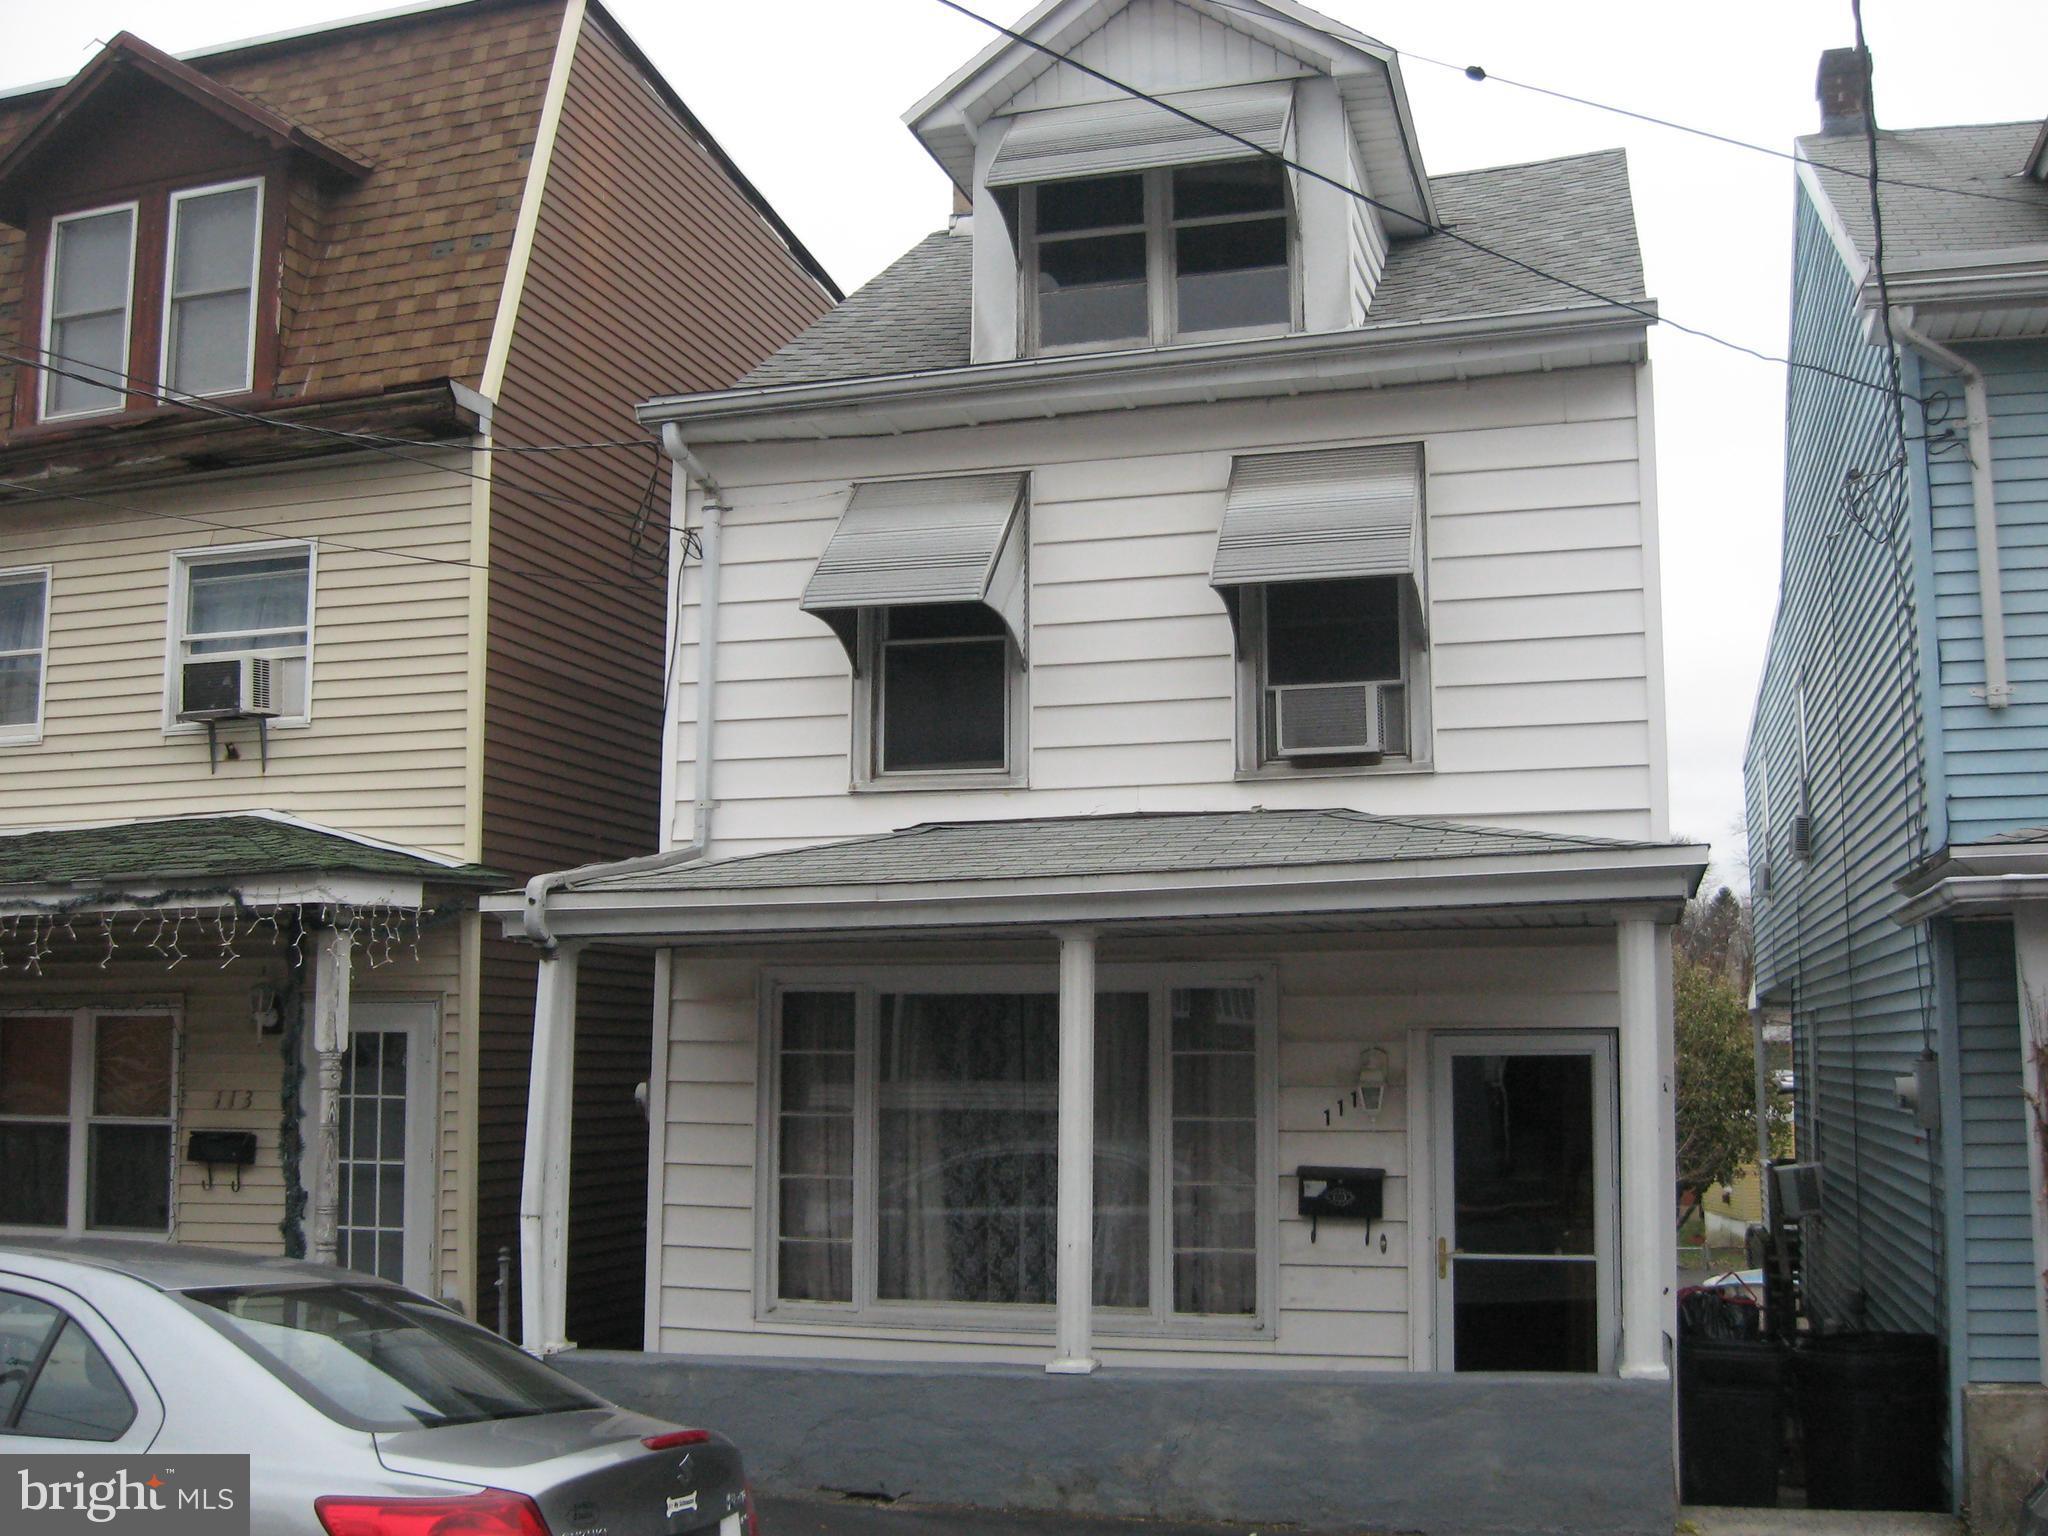 111 BROAD STREET, SAINT CLAIR, PA 17970